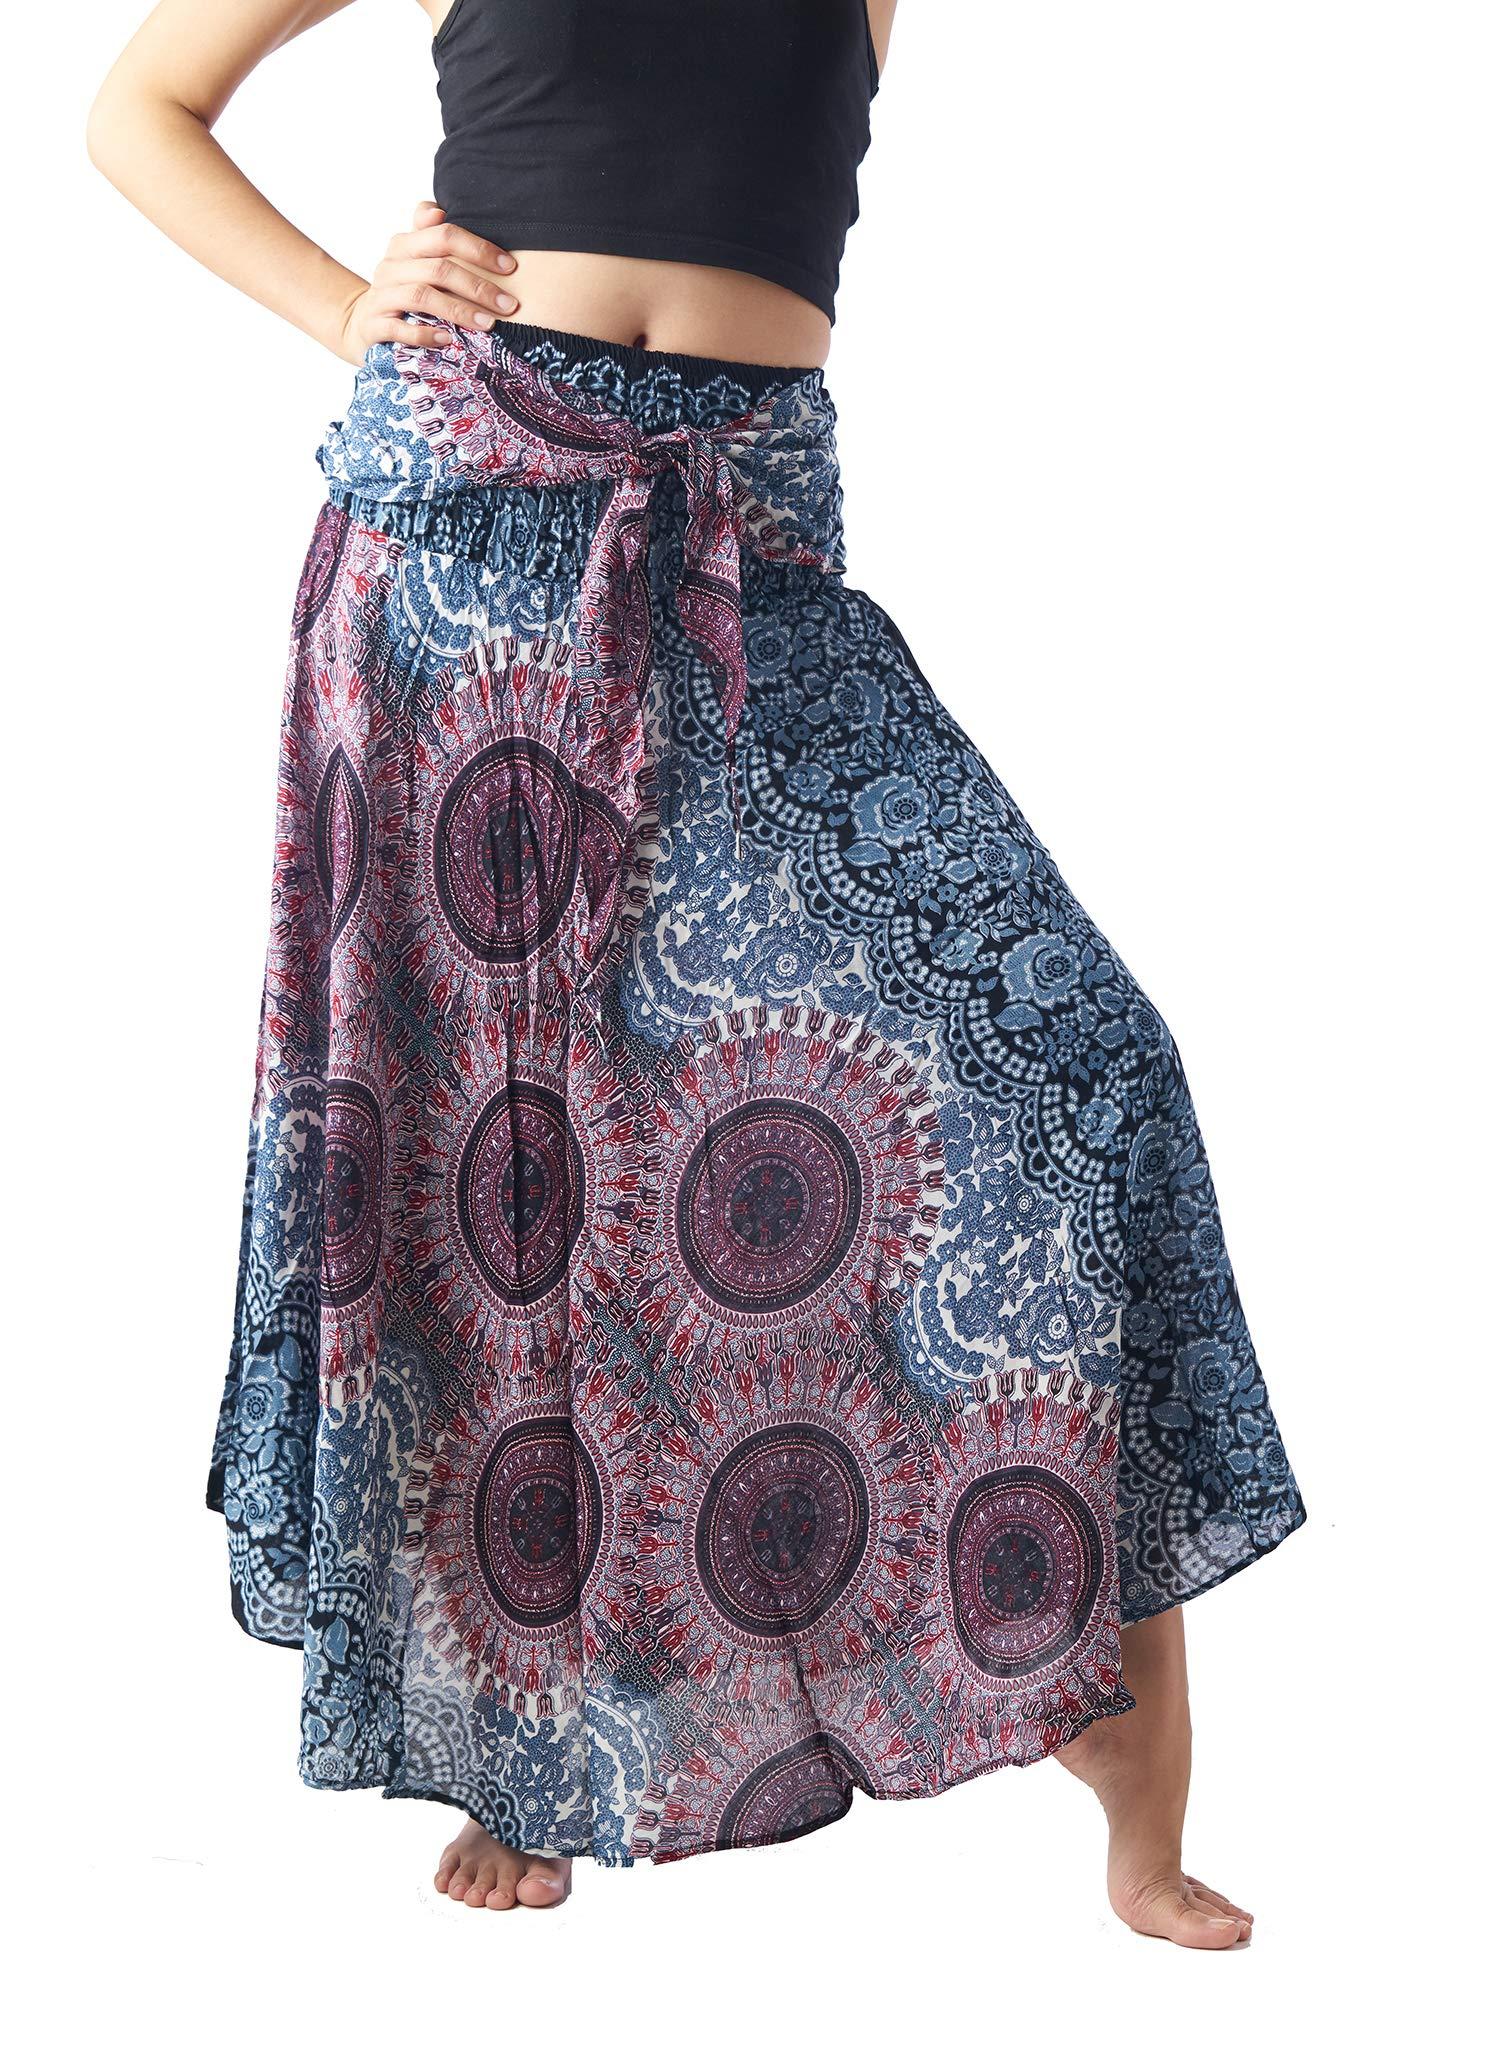 a243f578592fd Bangkokpants Women's Long Hippie Bohemian Skirt Gypsy Dress Boho Clothes  Flowers One Size Fits Asymmetric Hem Design ...